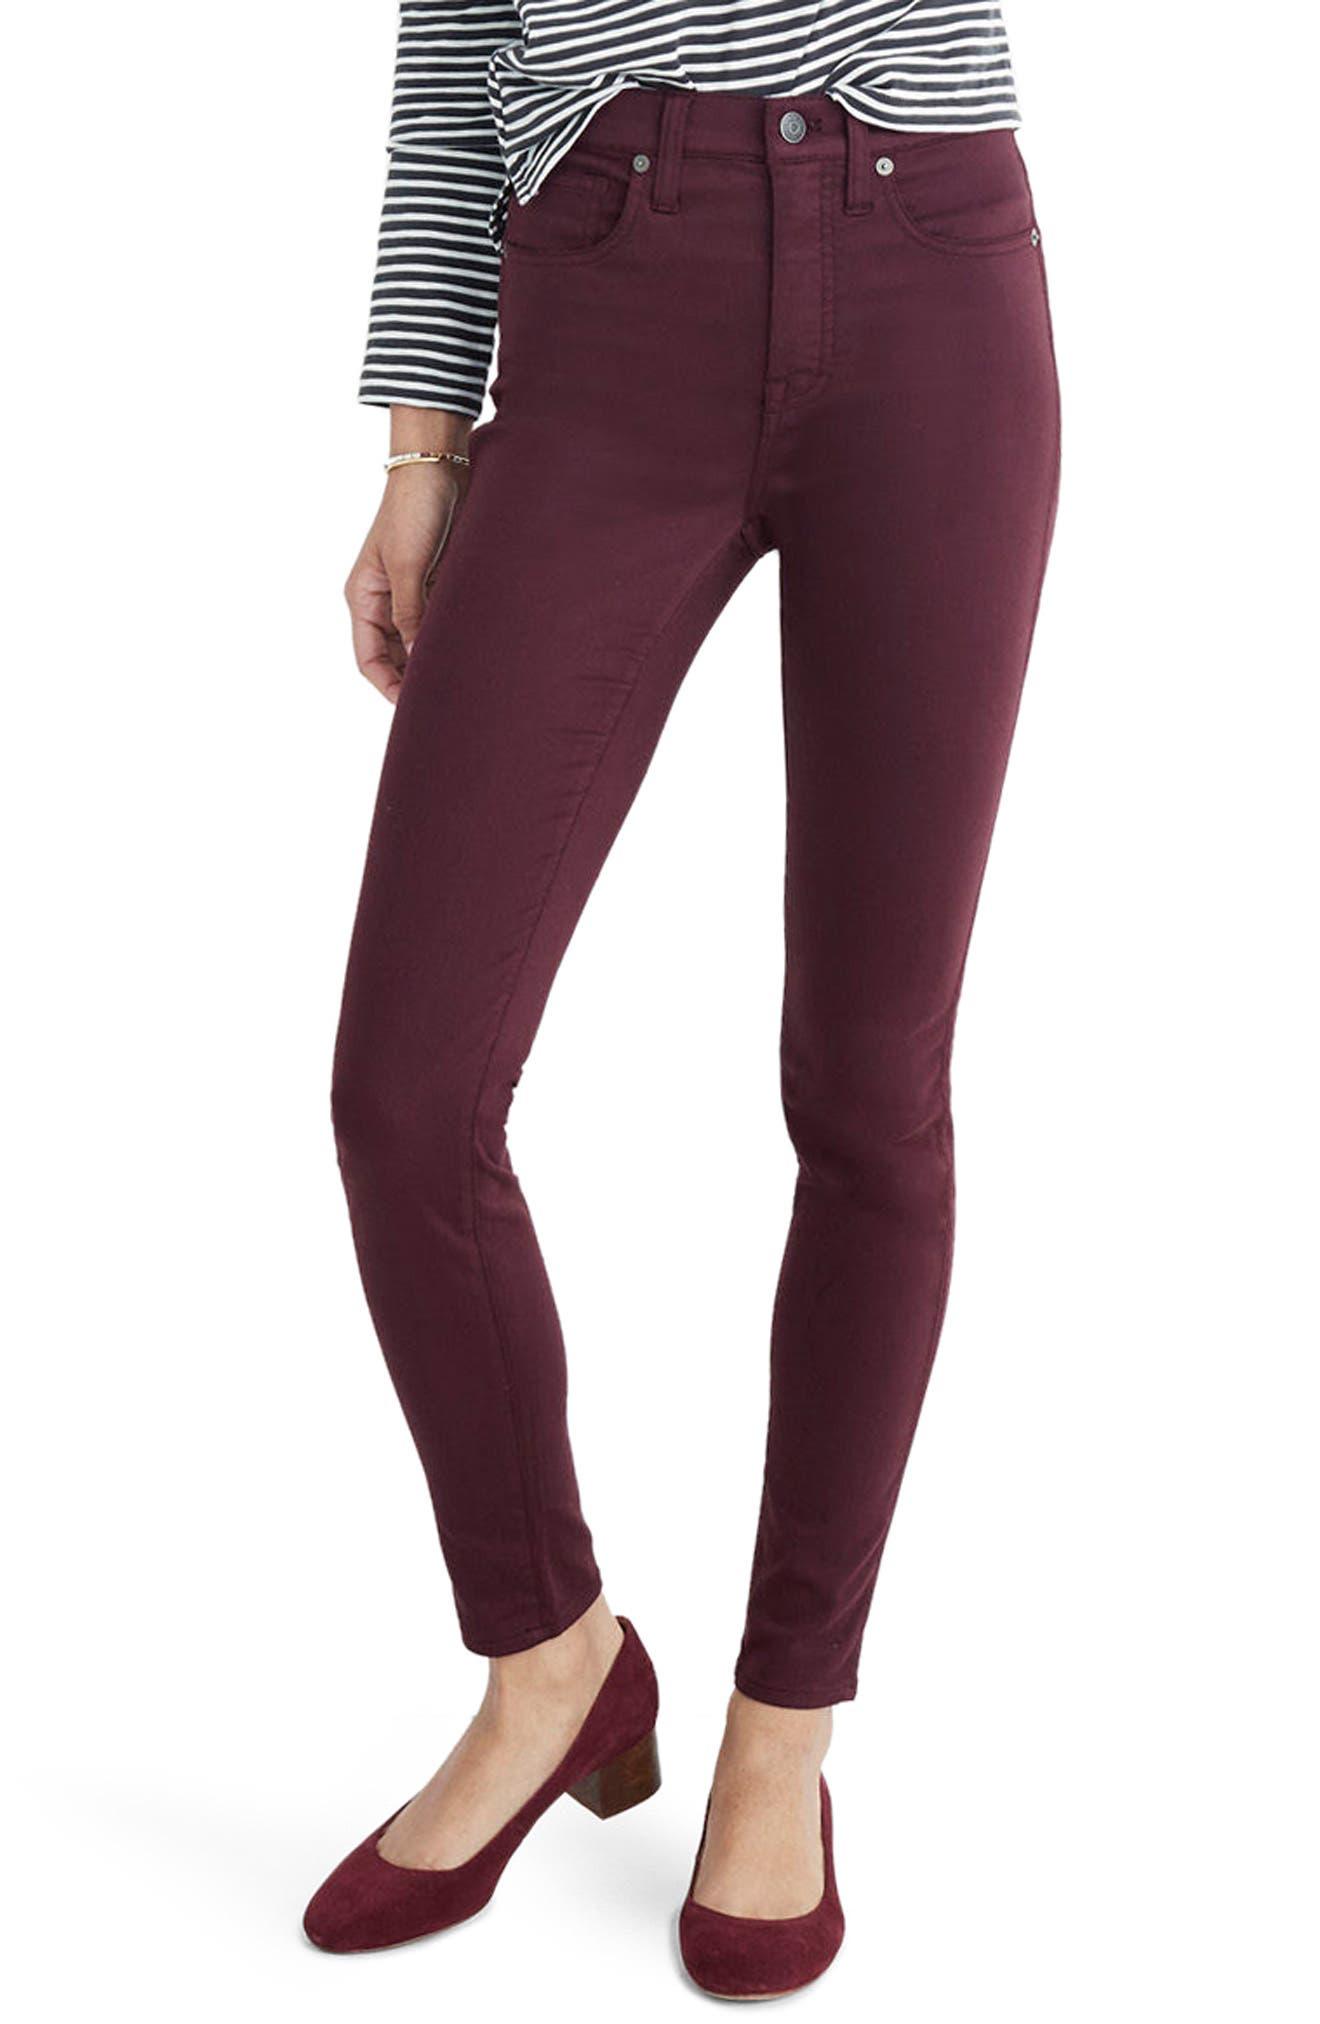 10-Inch High Waist Skinny Sateen Jeans,                         Main,                         color, Deep Plum